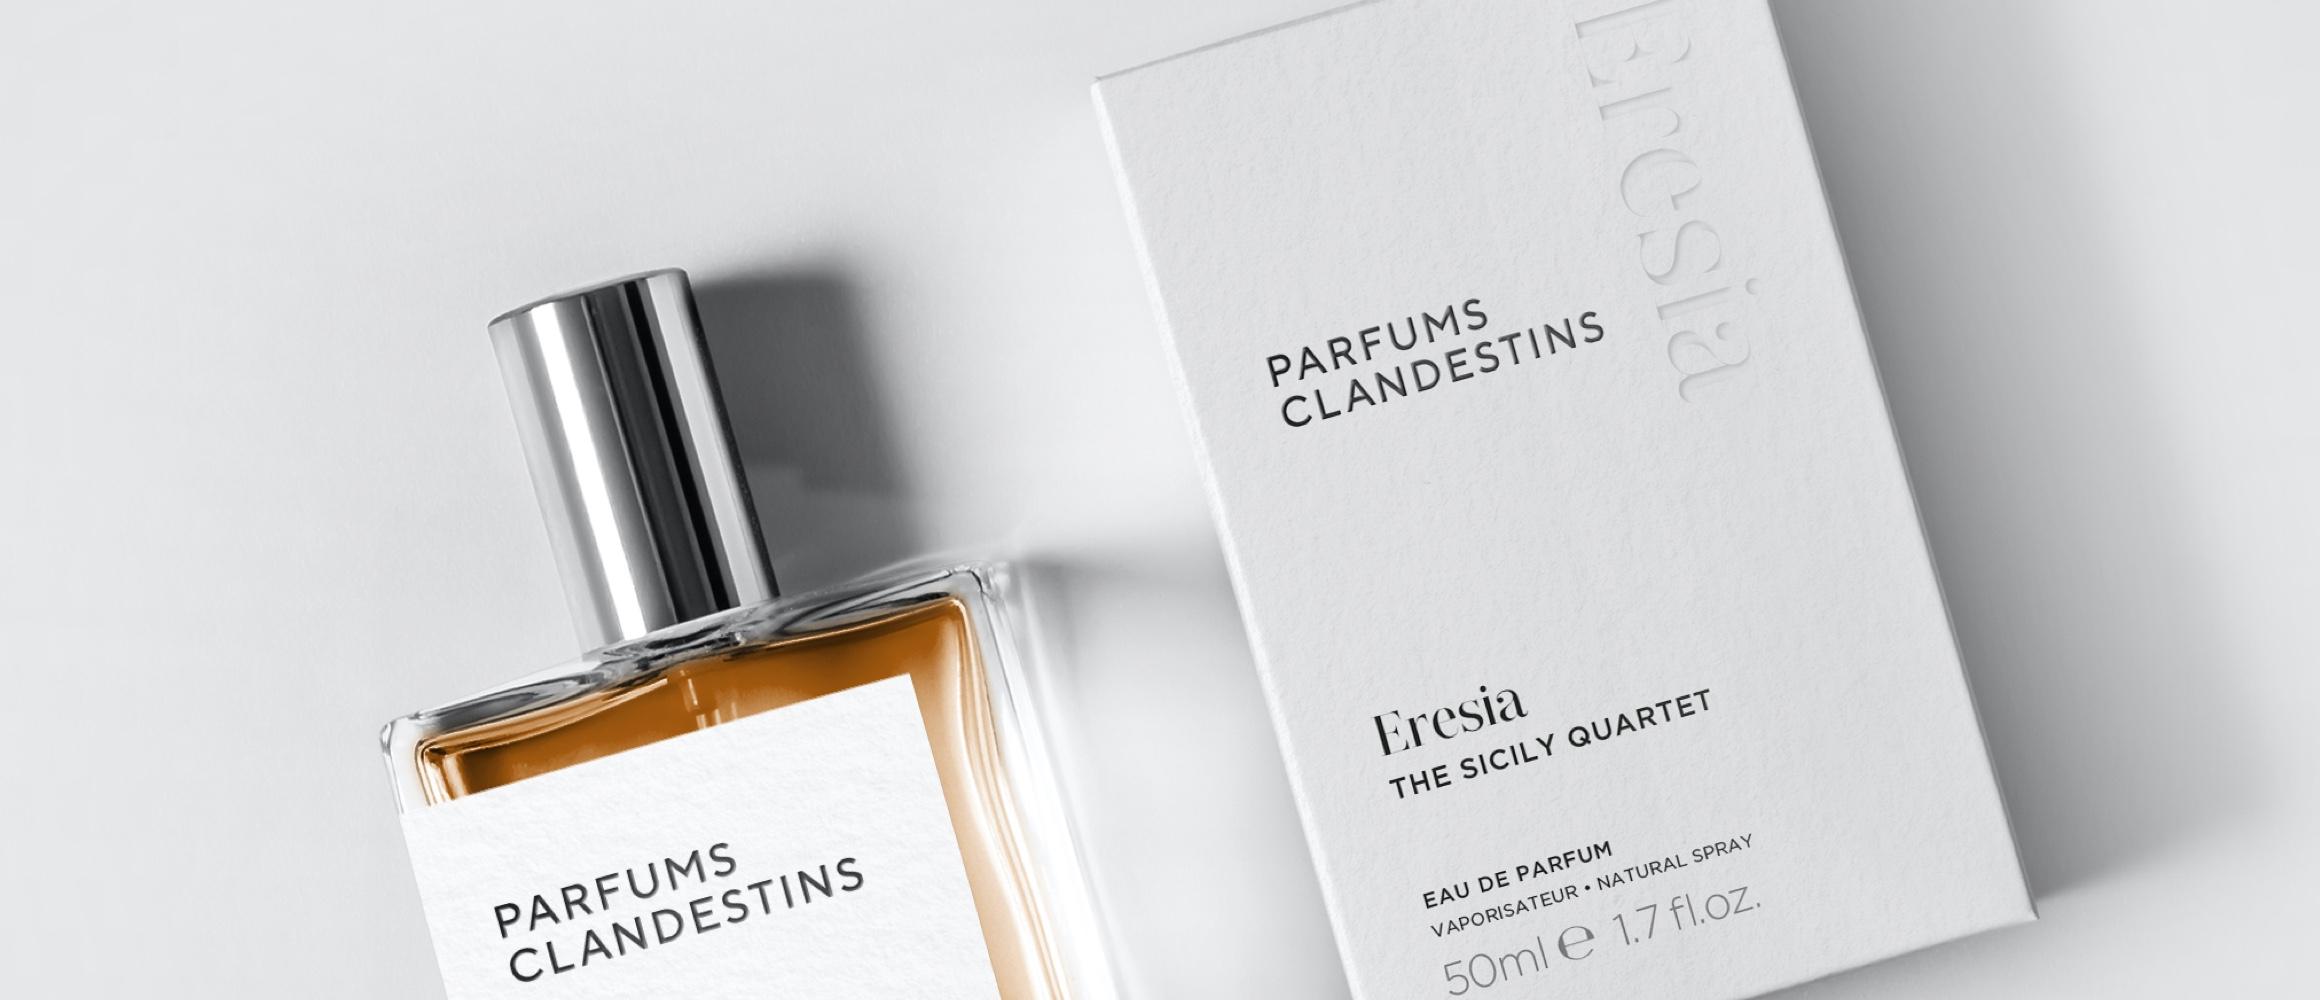 Parfums Clandestins